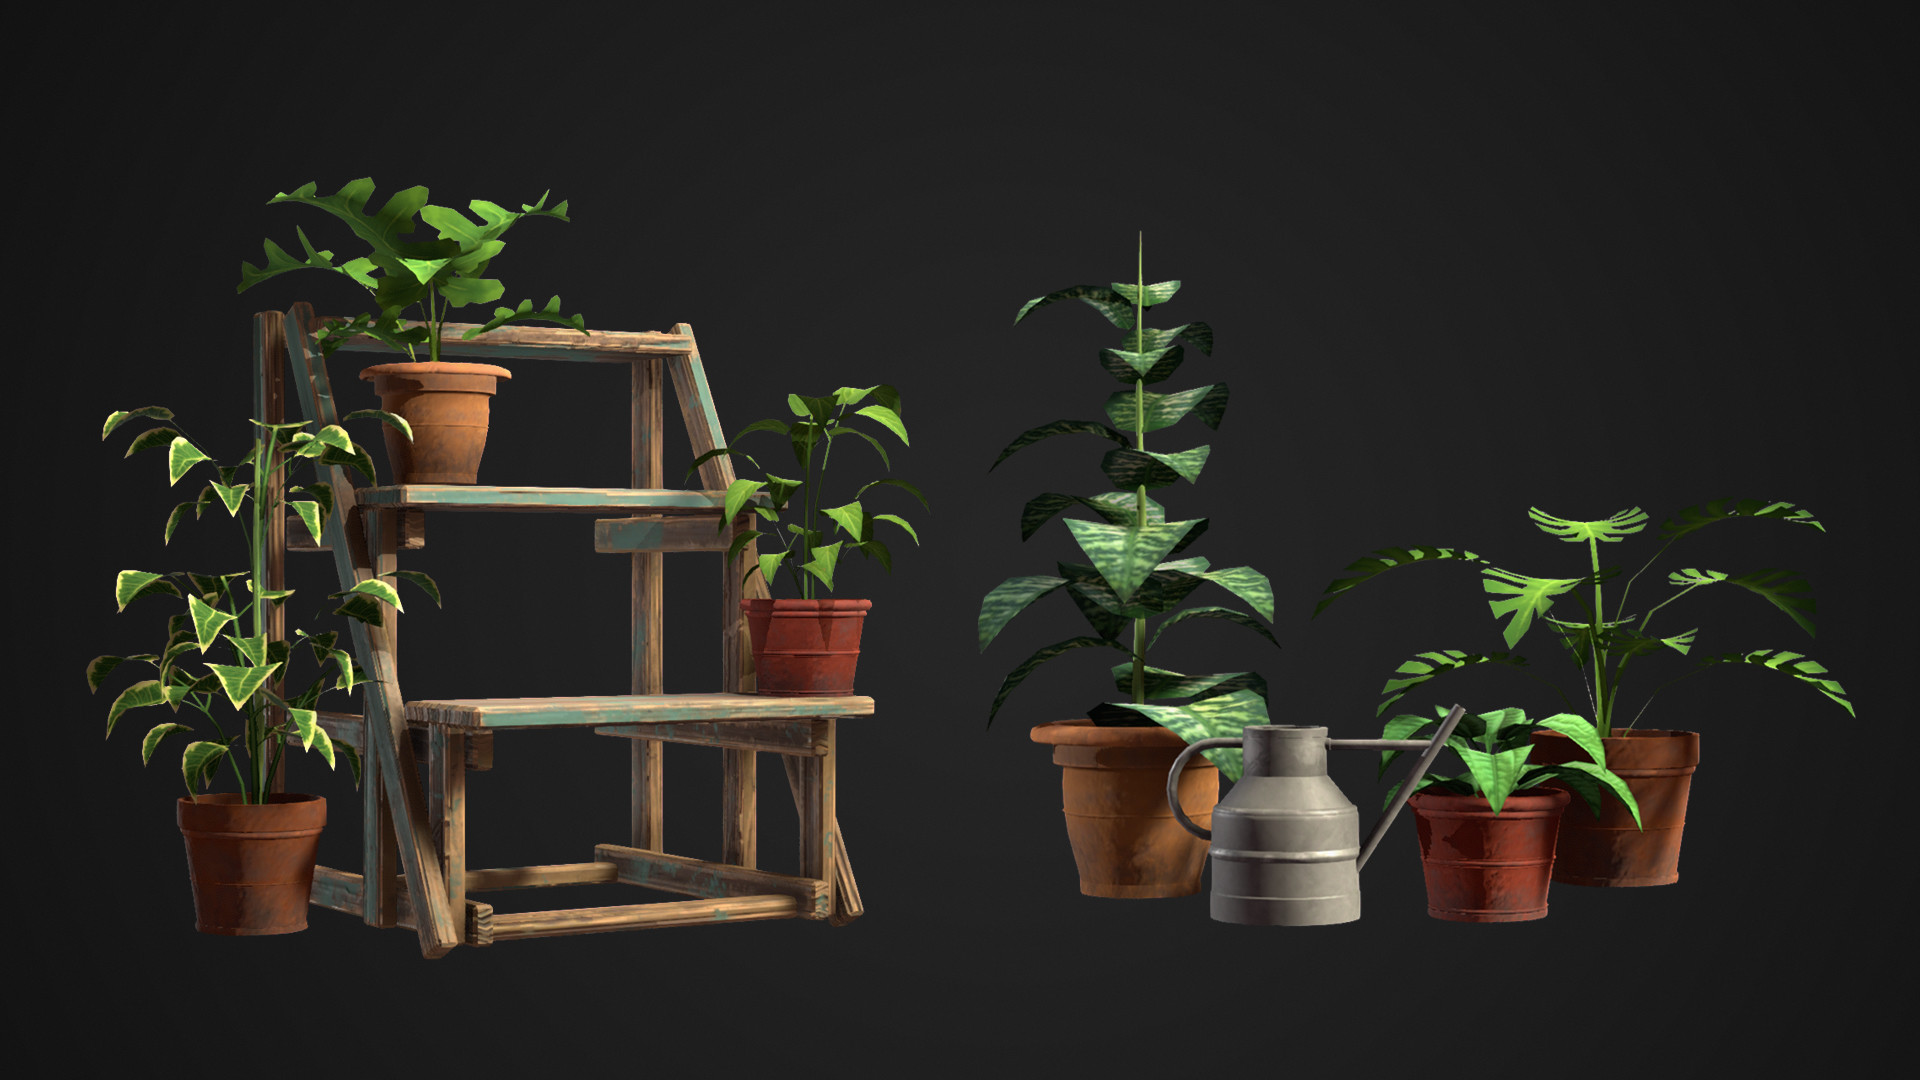 Nicolas tham props plants